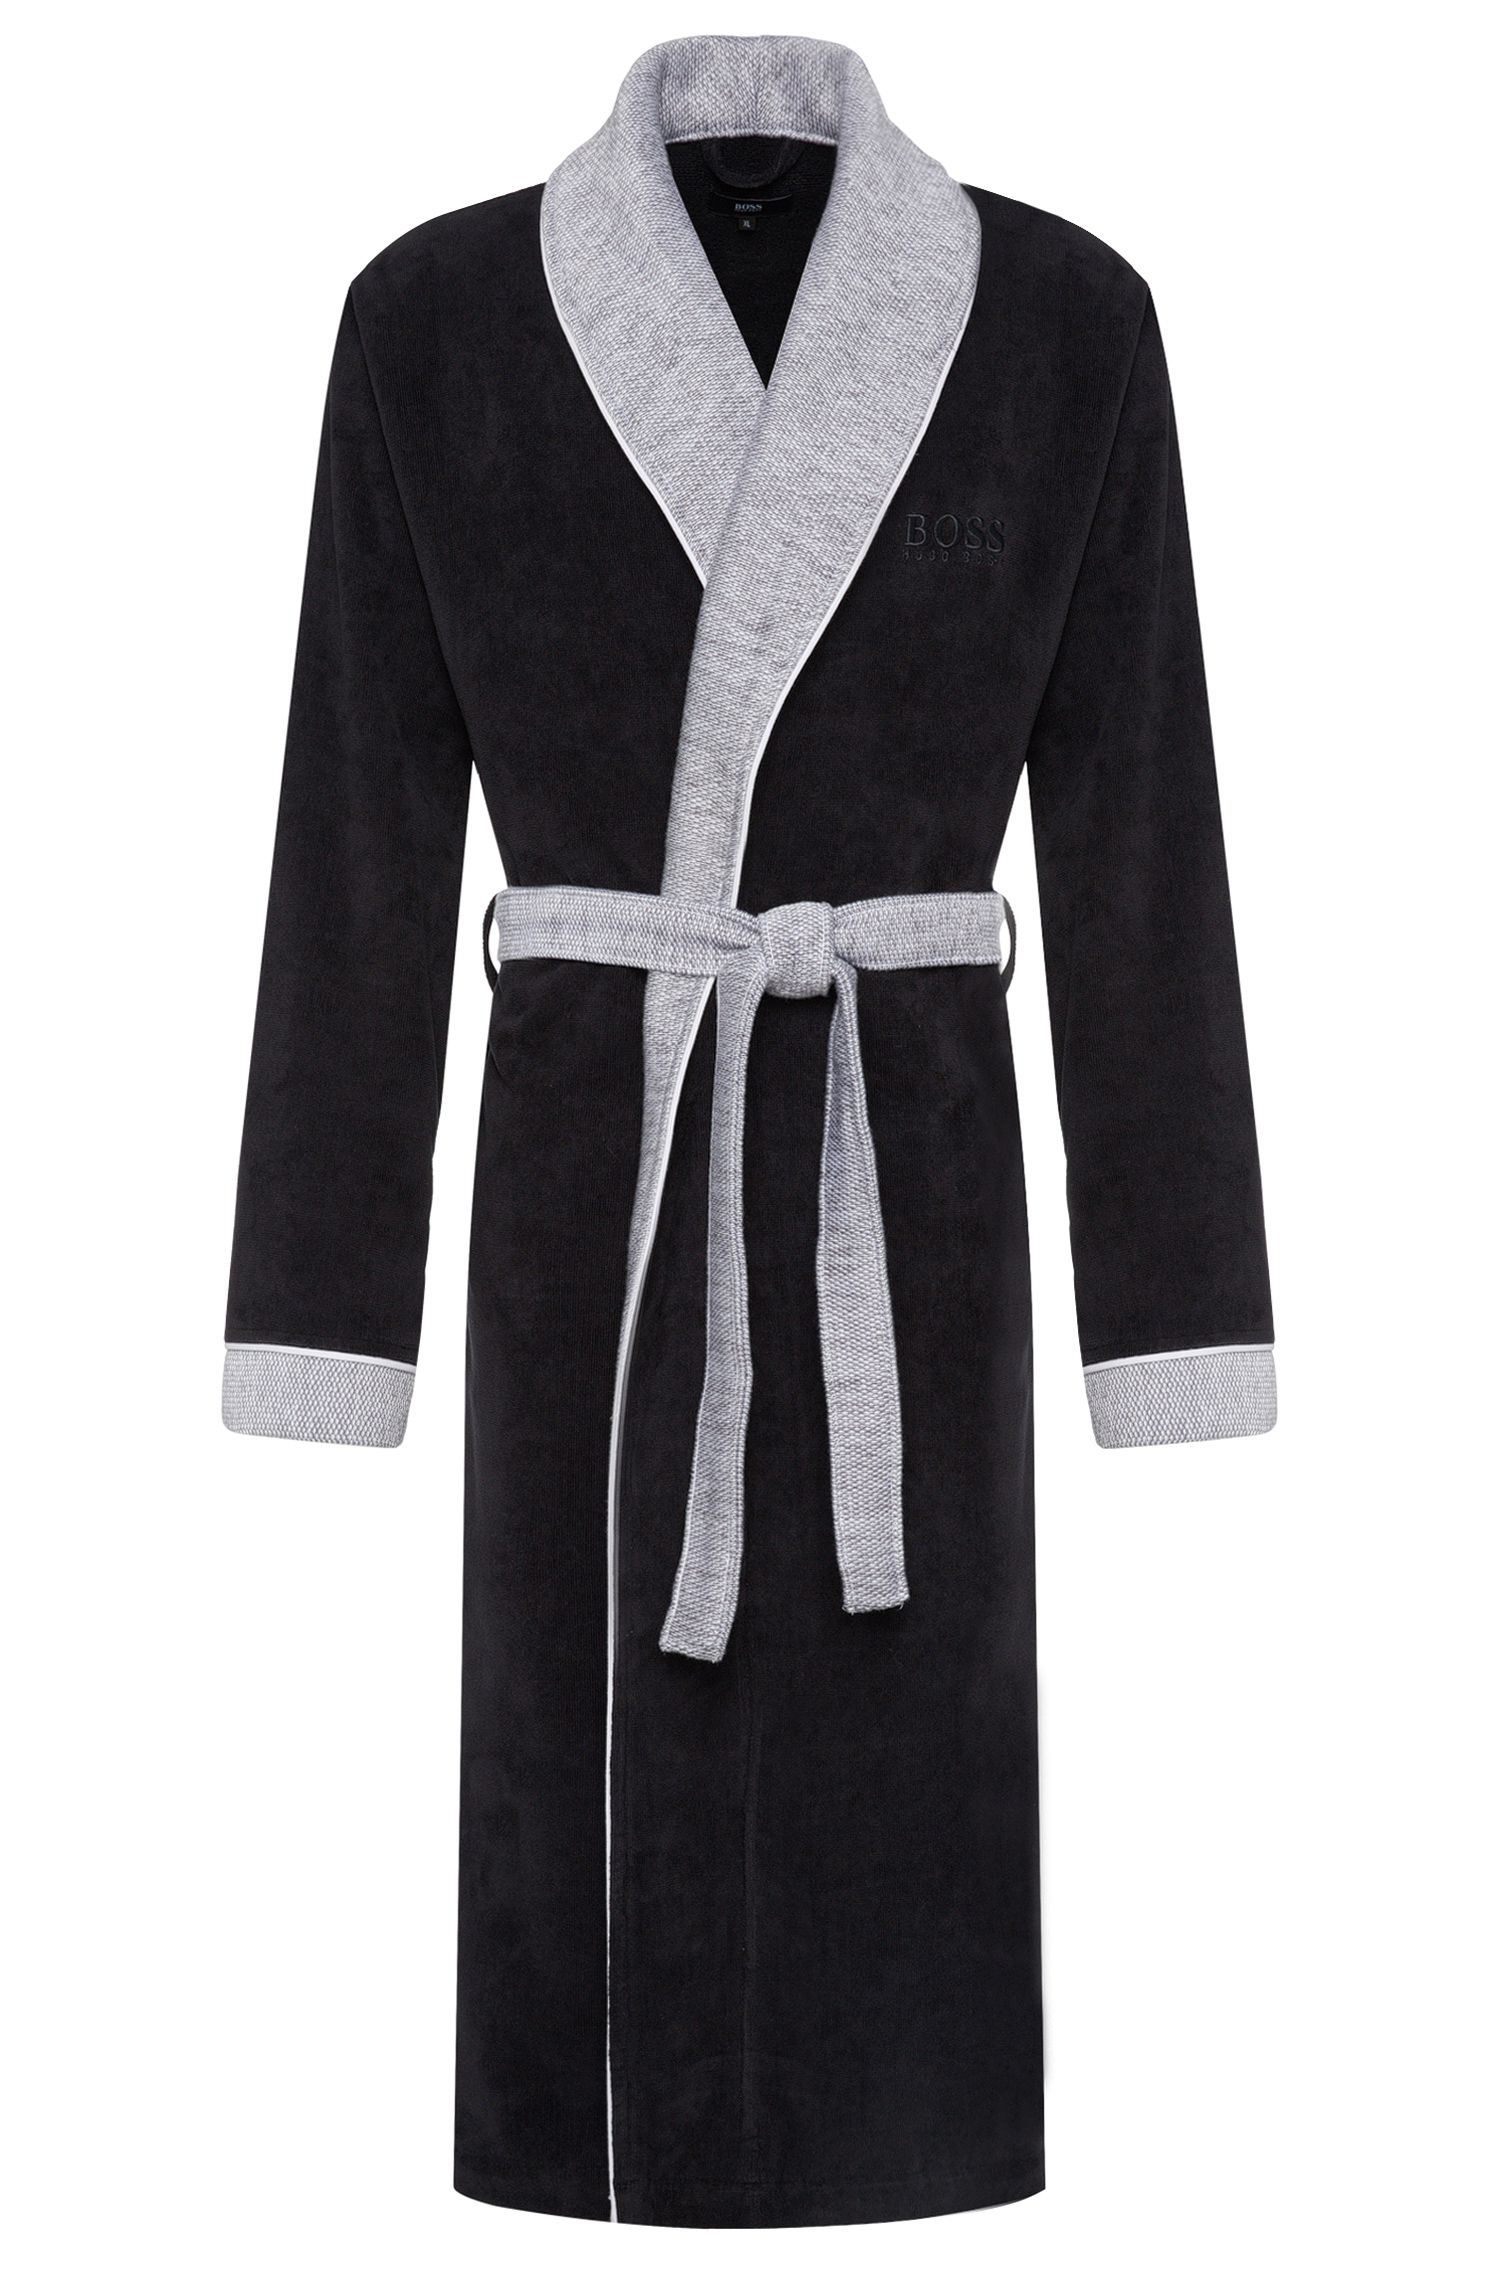 Cotton bathrobe with shawl collar